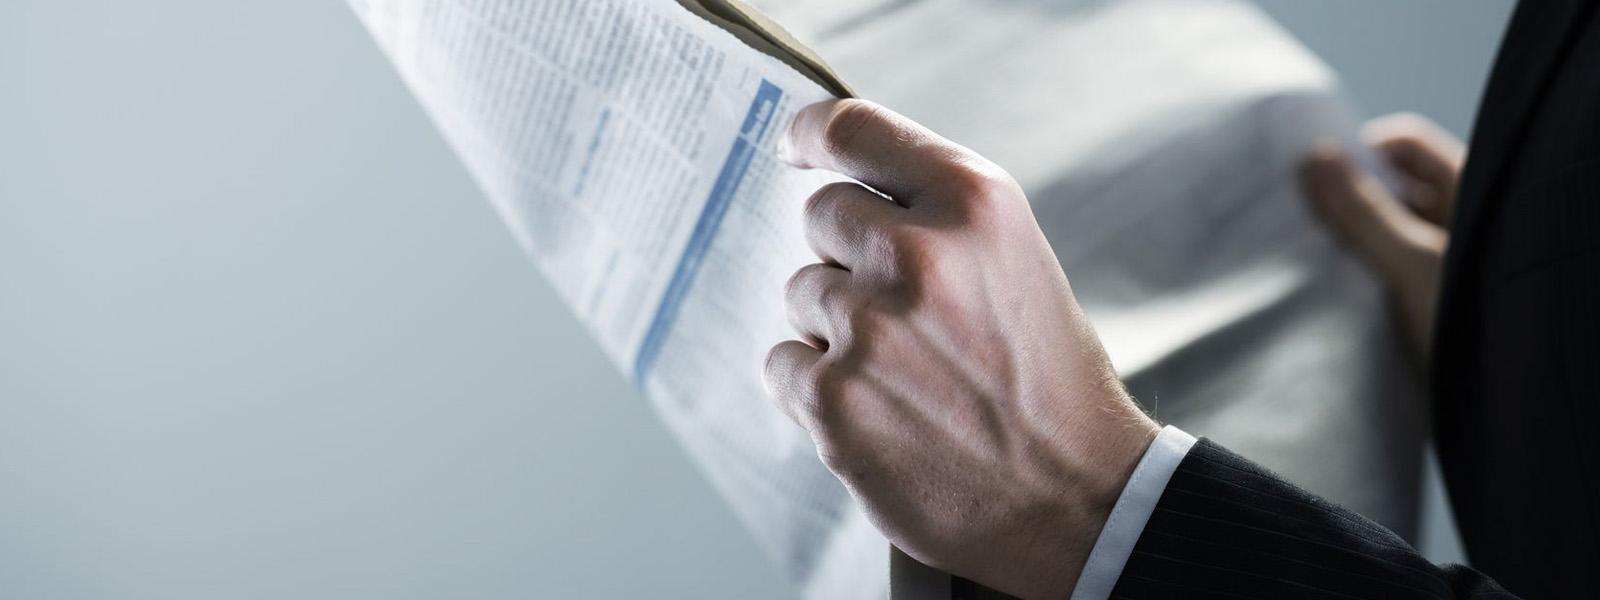 businessman holding newspaper in hands